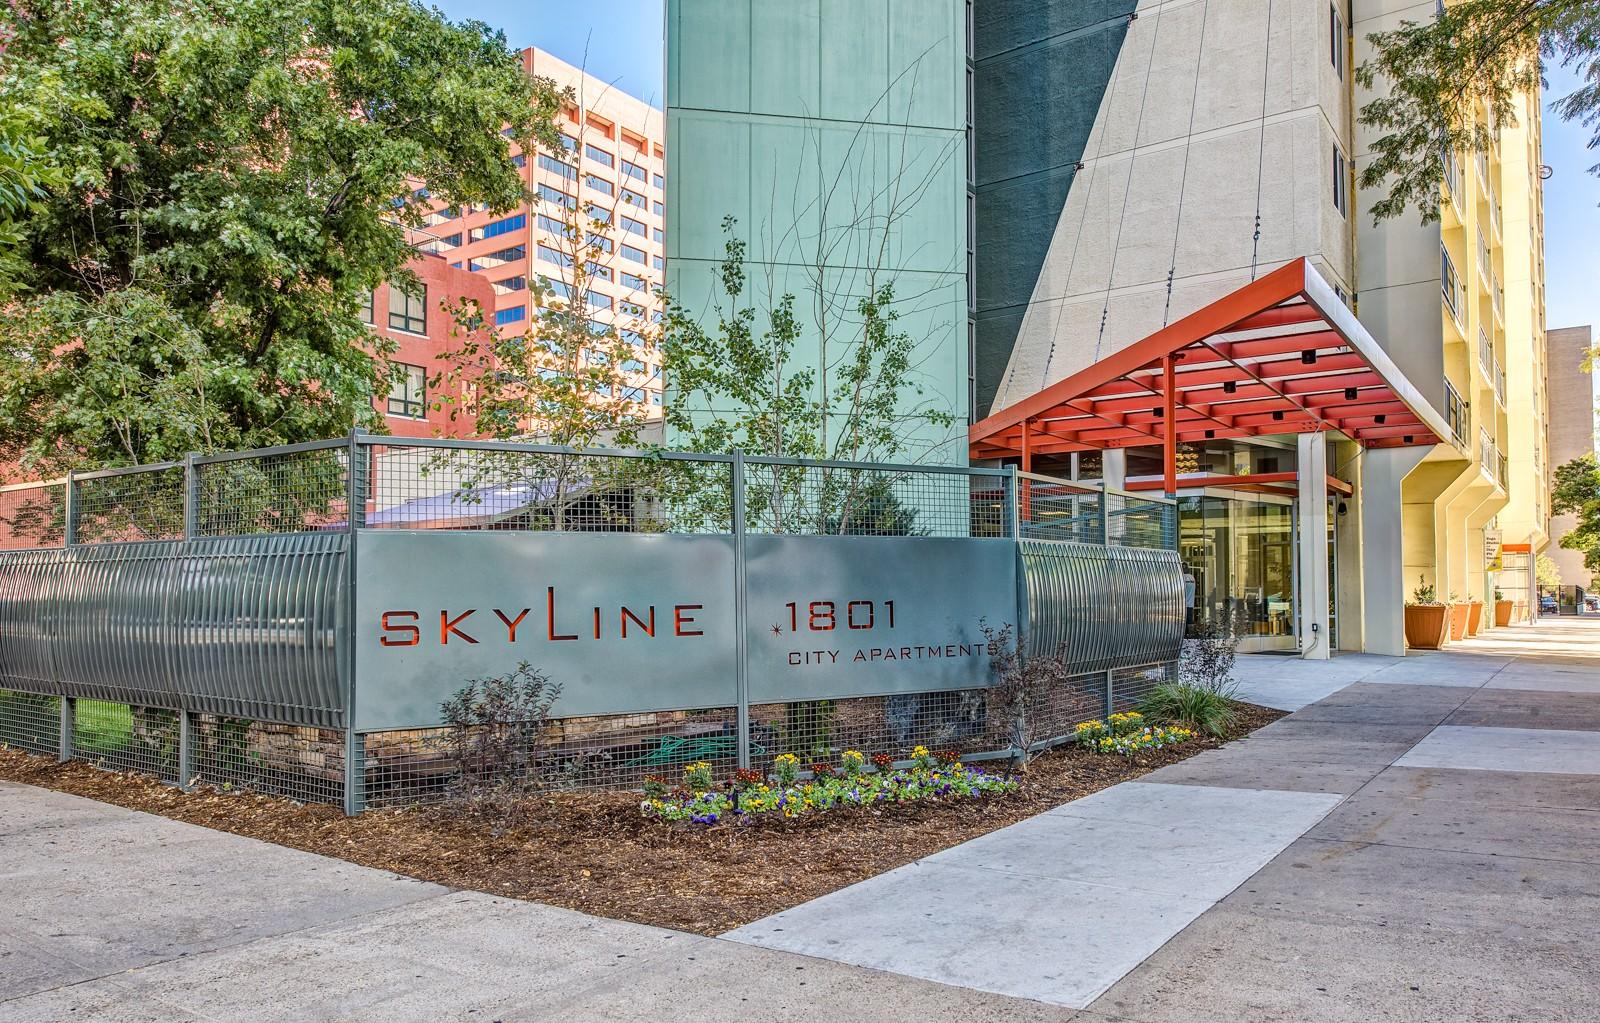 Apartments Near CU-Denver Skyline 1801 for University of Colorado at Denver Students in Denver, CO